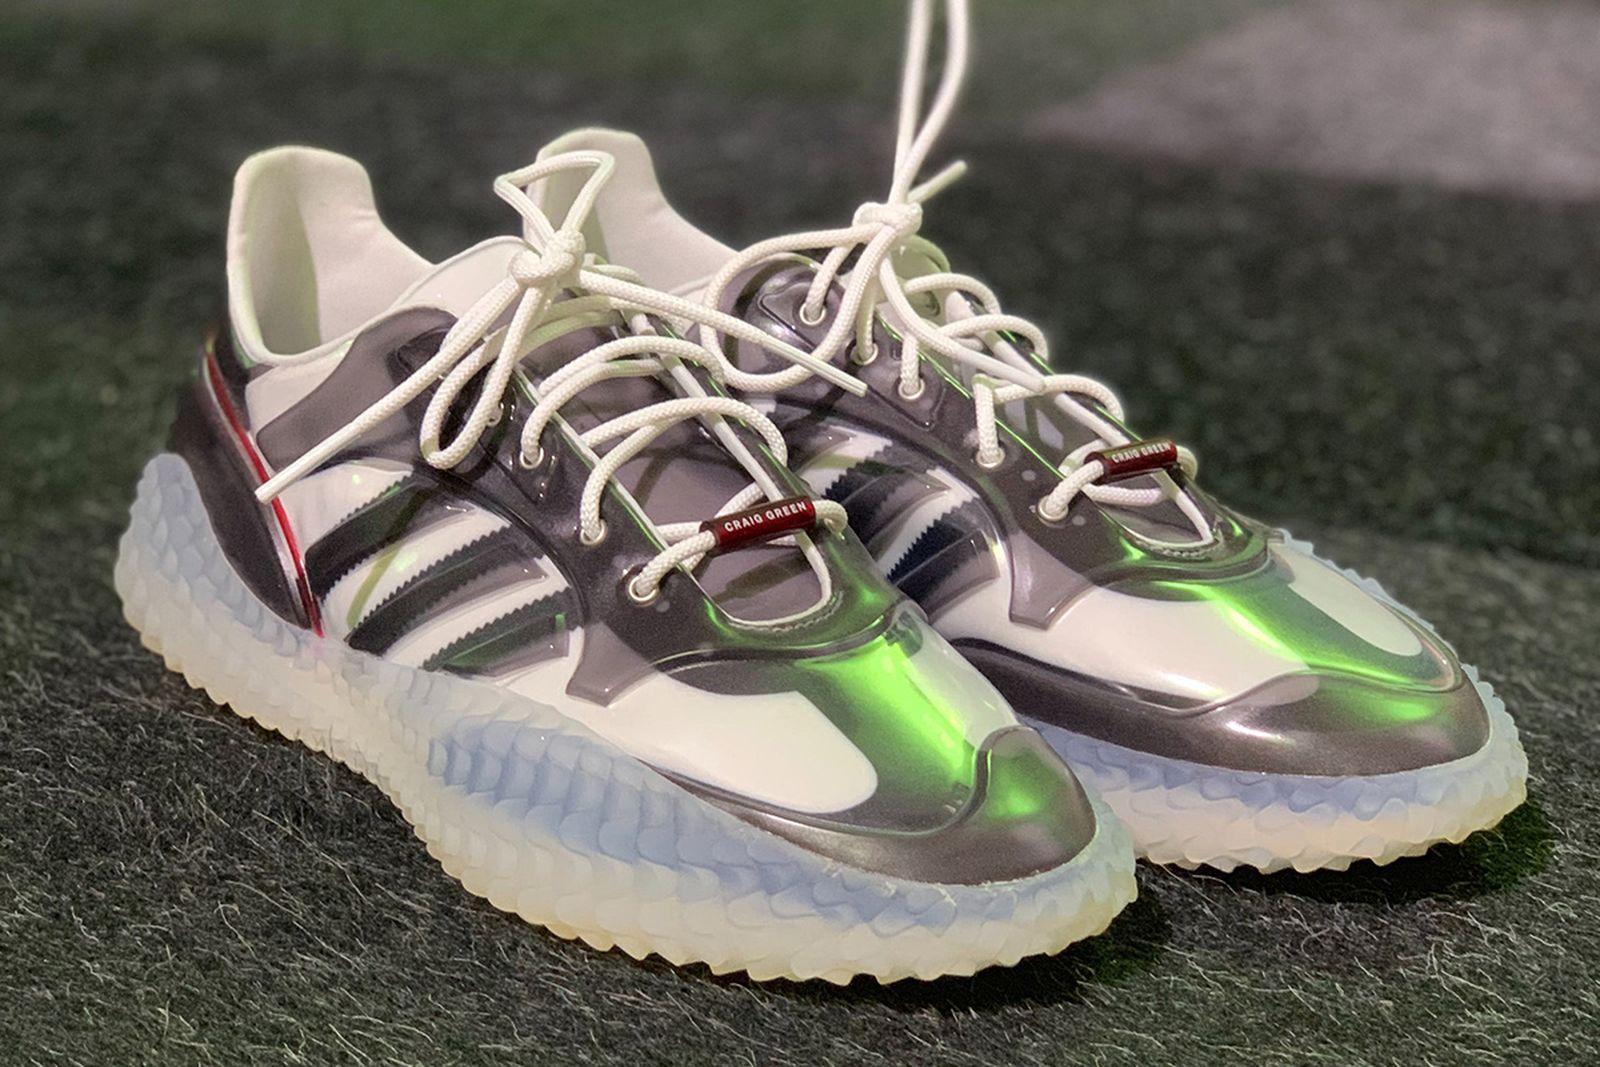 Craig Green x adidas Originals SS20 Collection: First Look